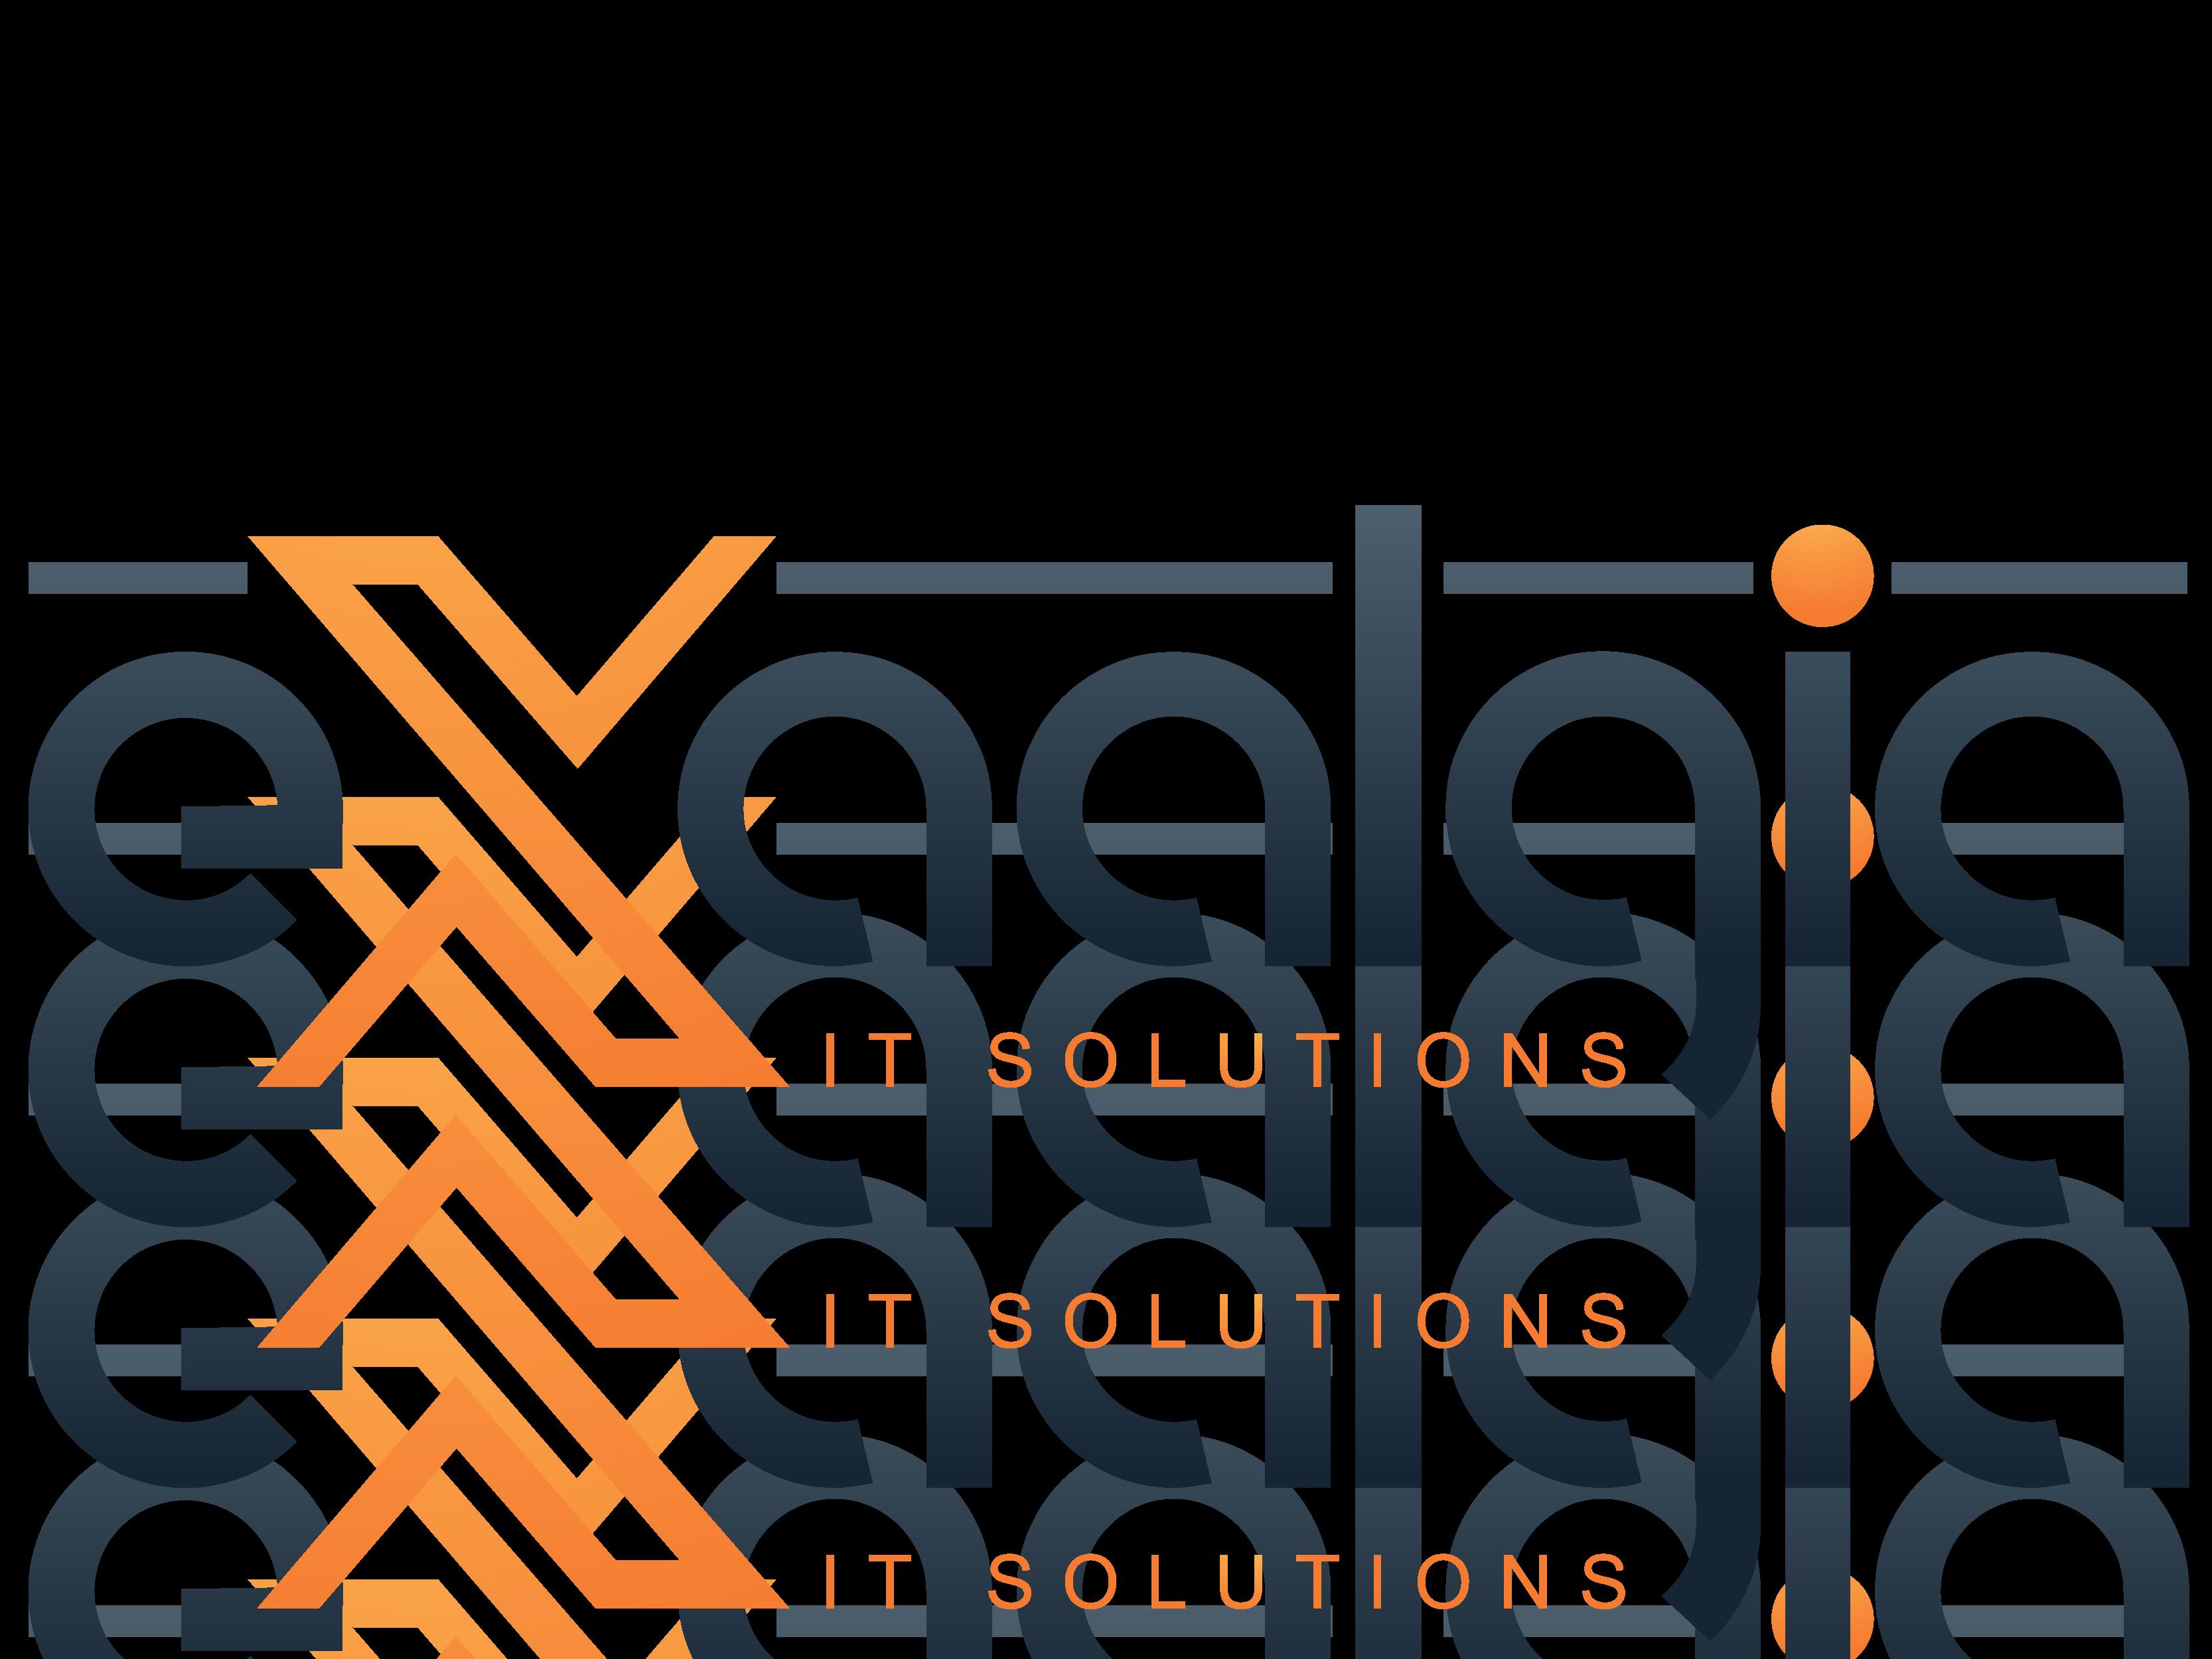 Exaalgia IT Solutions